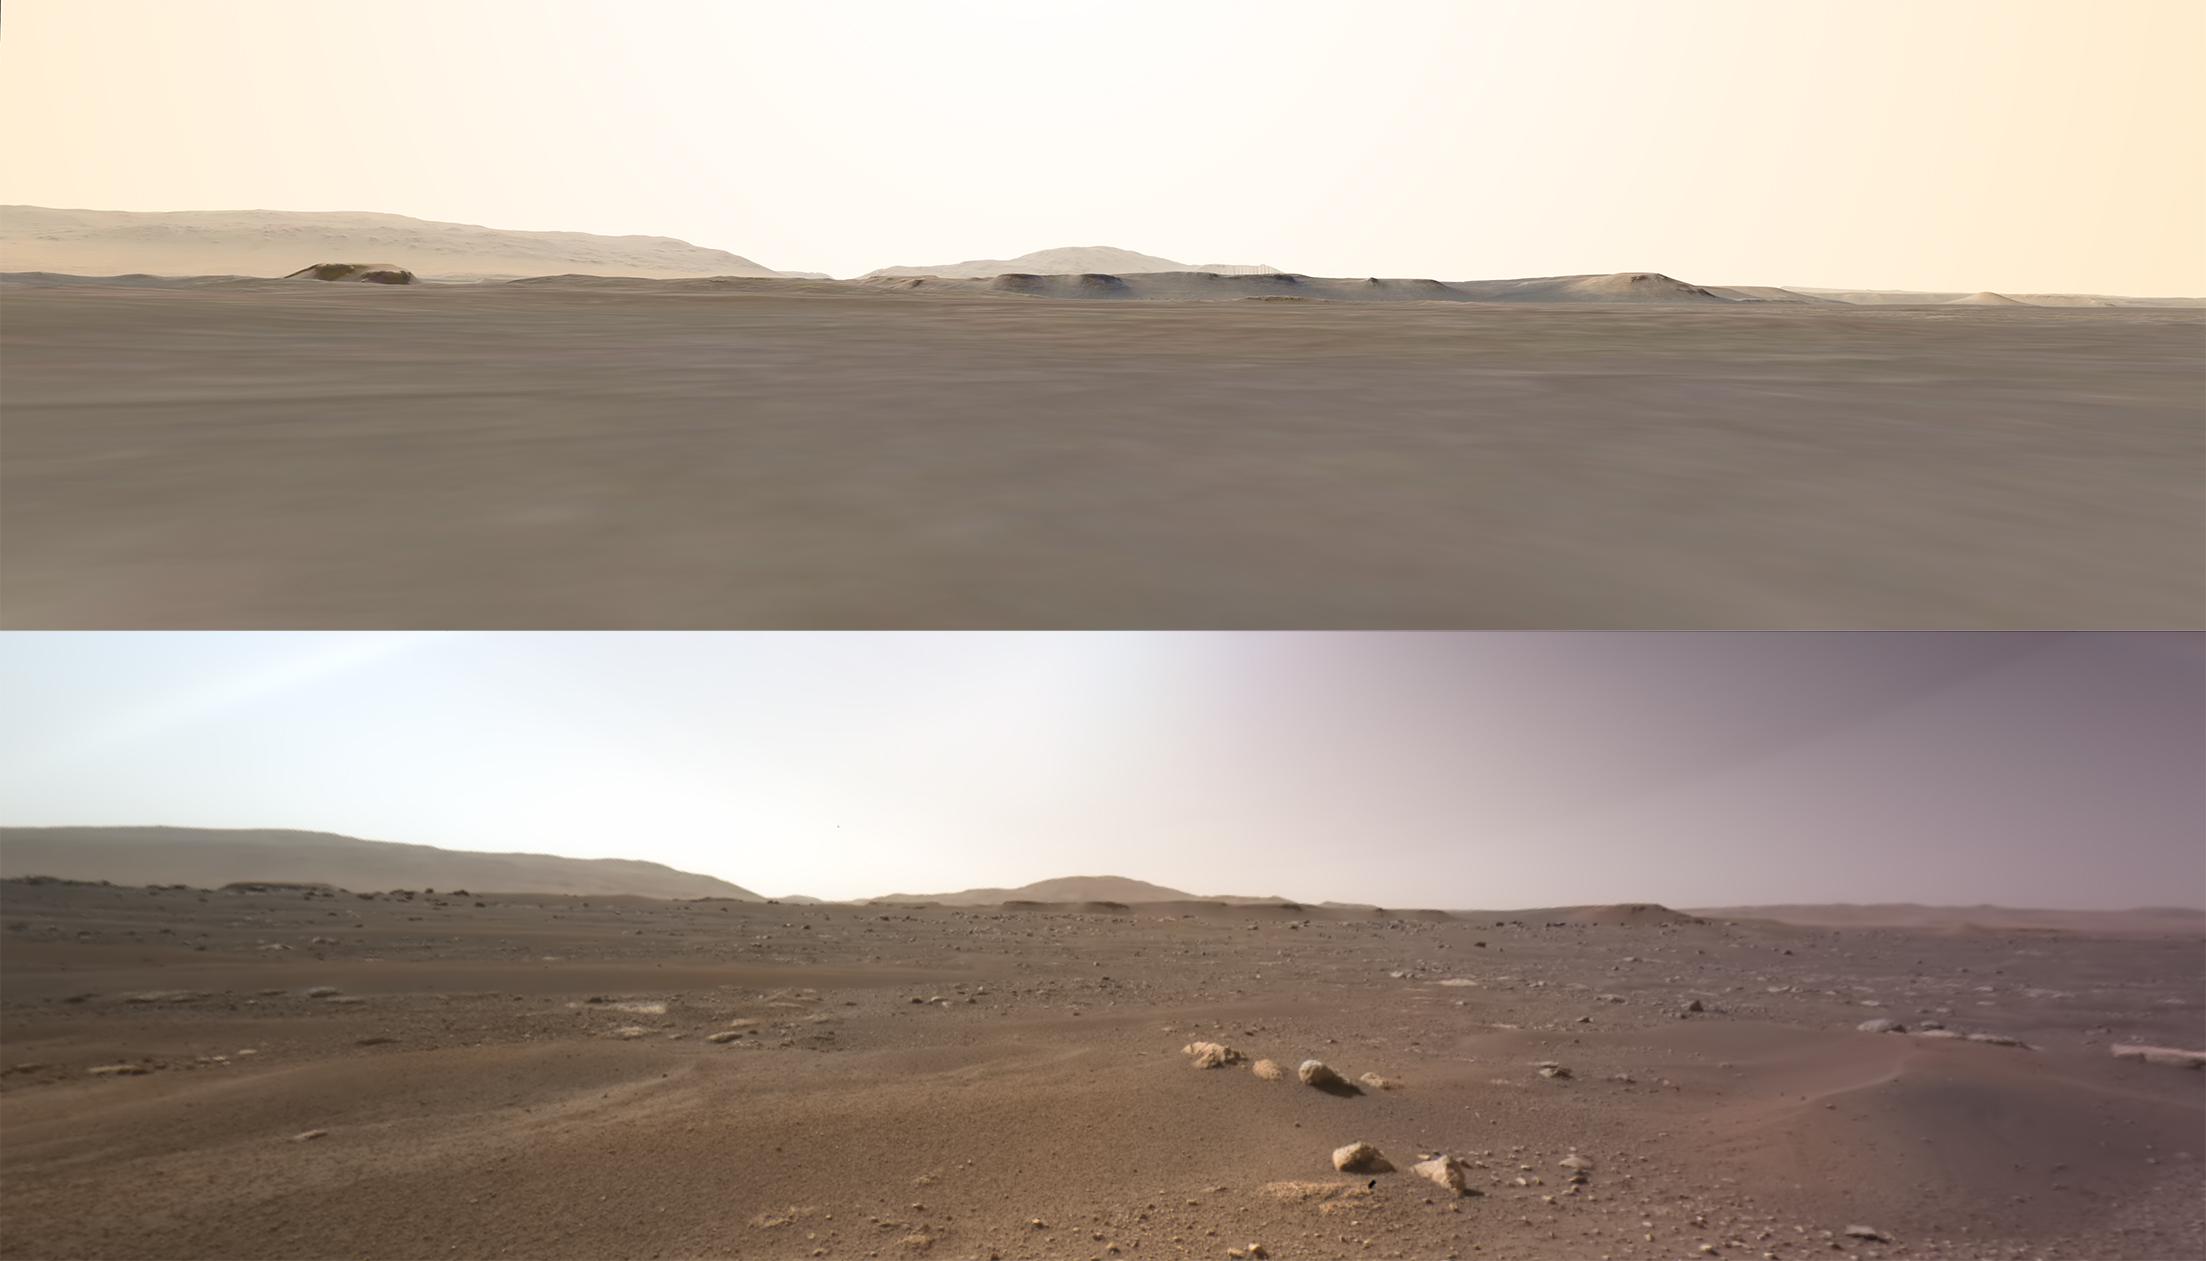 """Perseverance"" Rover (Mars - krater Jezero) : Novih 7 MINUTA TERORA  - Page 5 Eu1w3Y_XcAI4ivT?format=jpg&name=4096x4096"